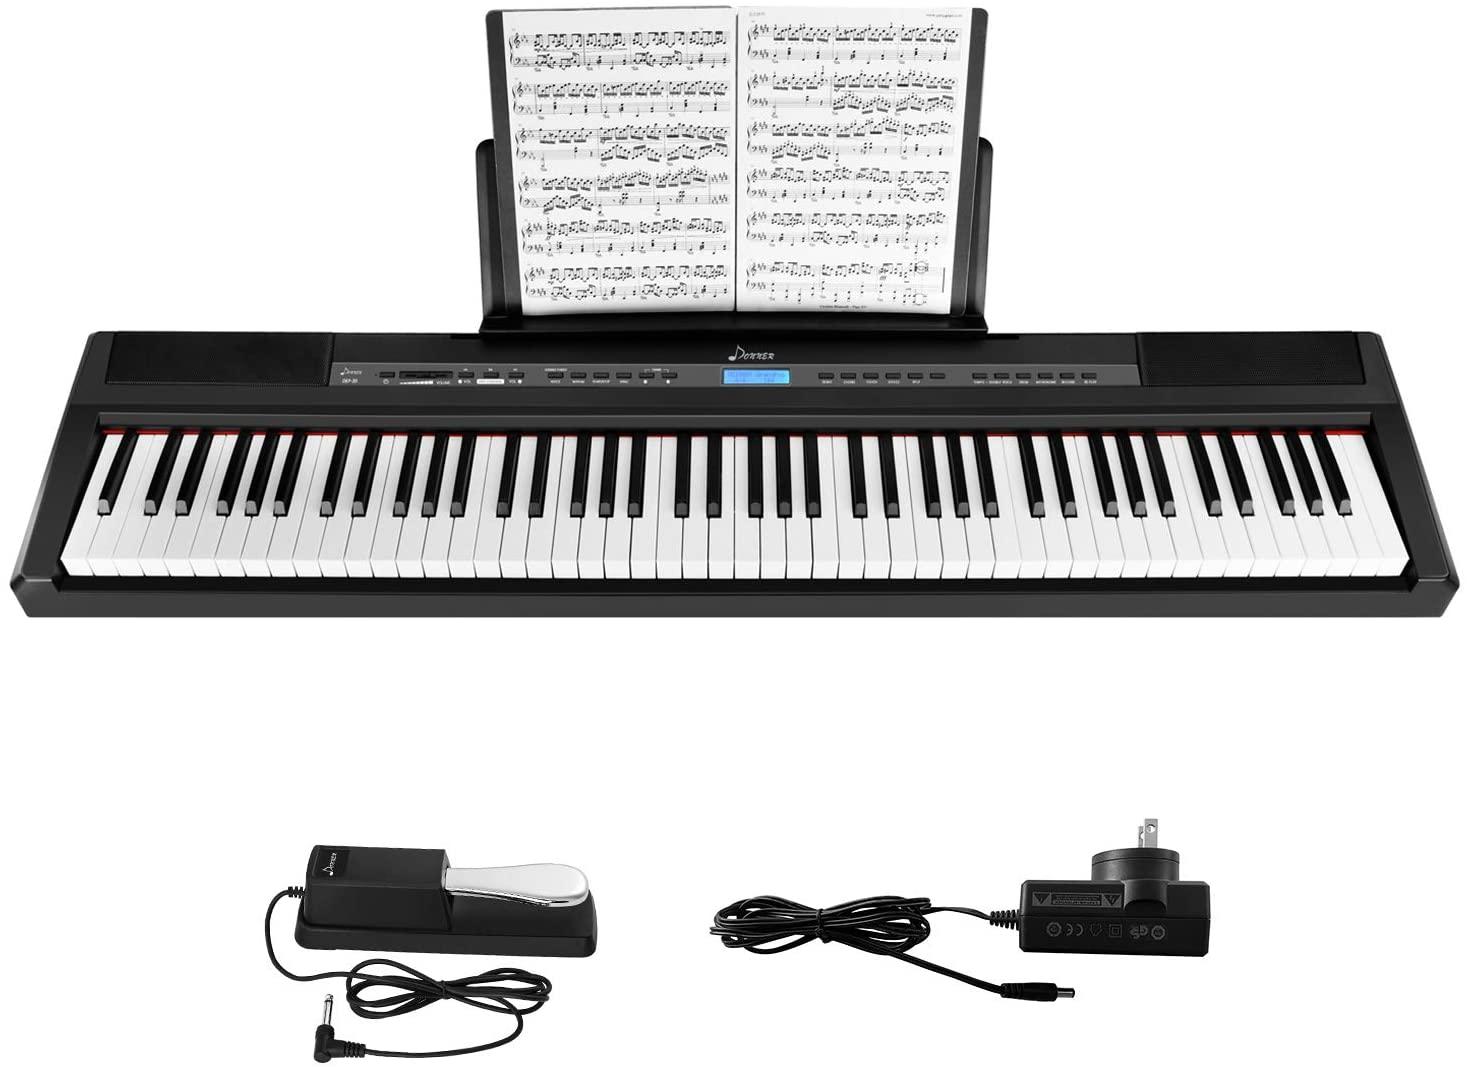 Donner DEP-20 Beginner Digital Piano 88 Key